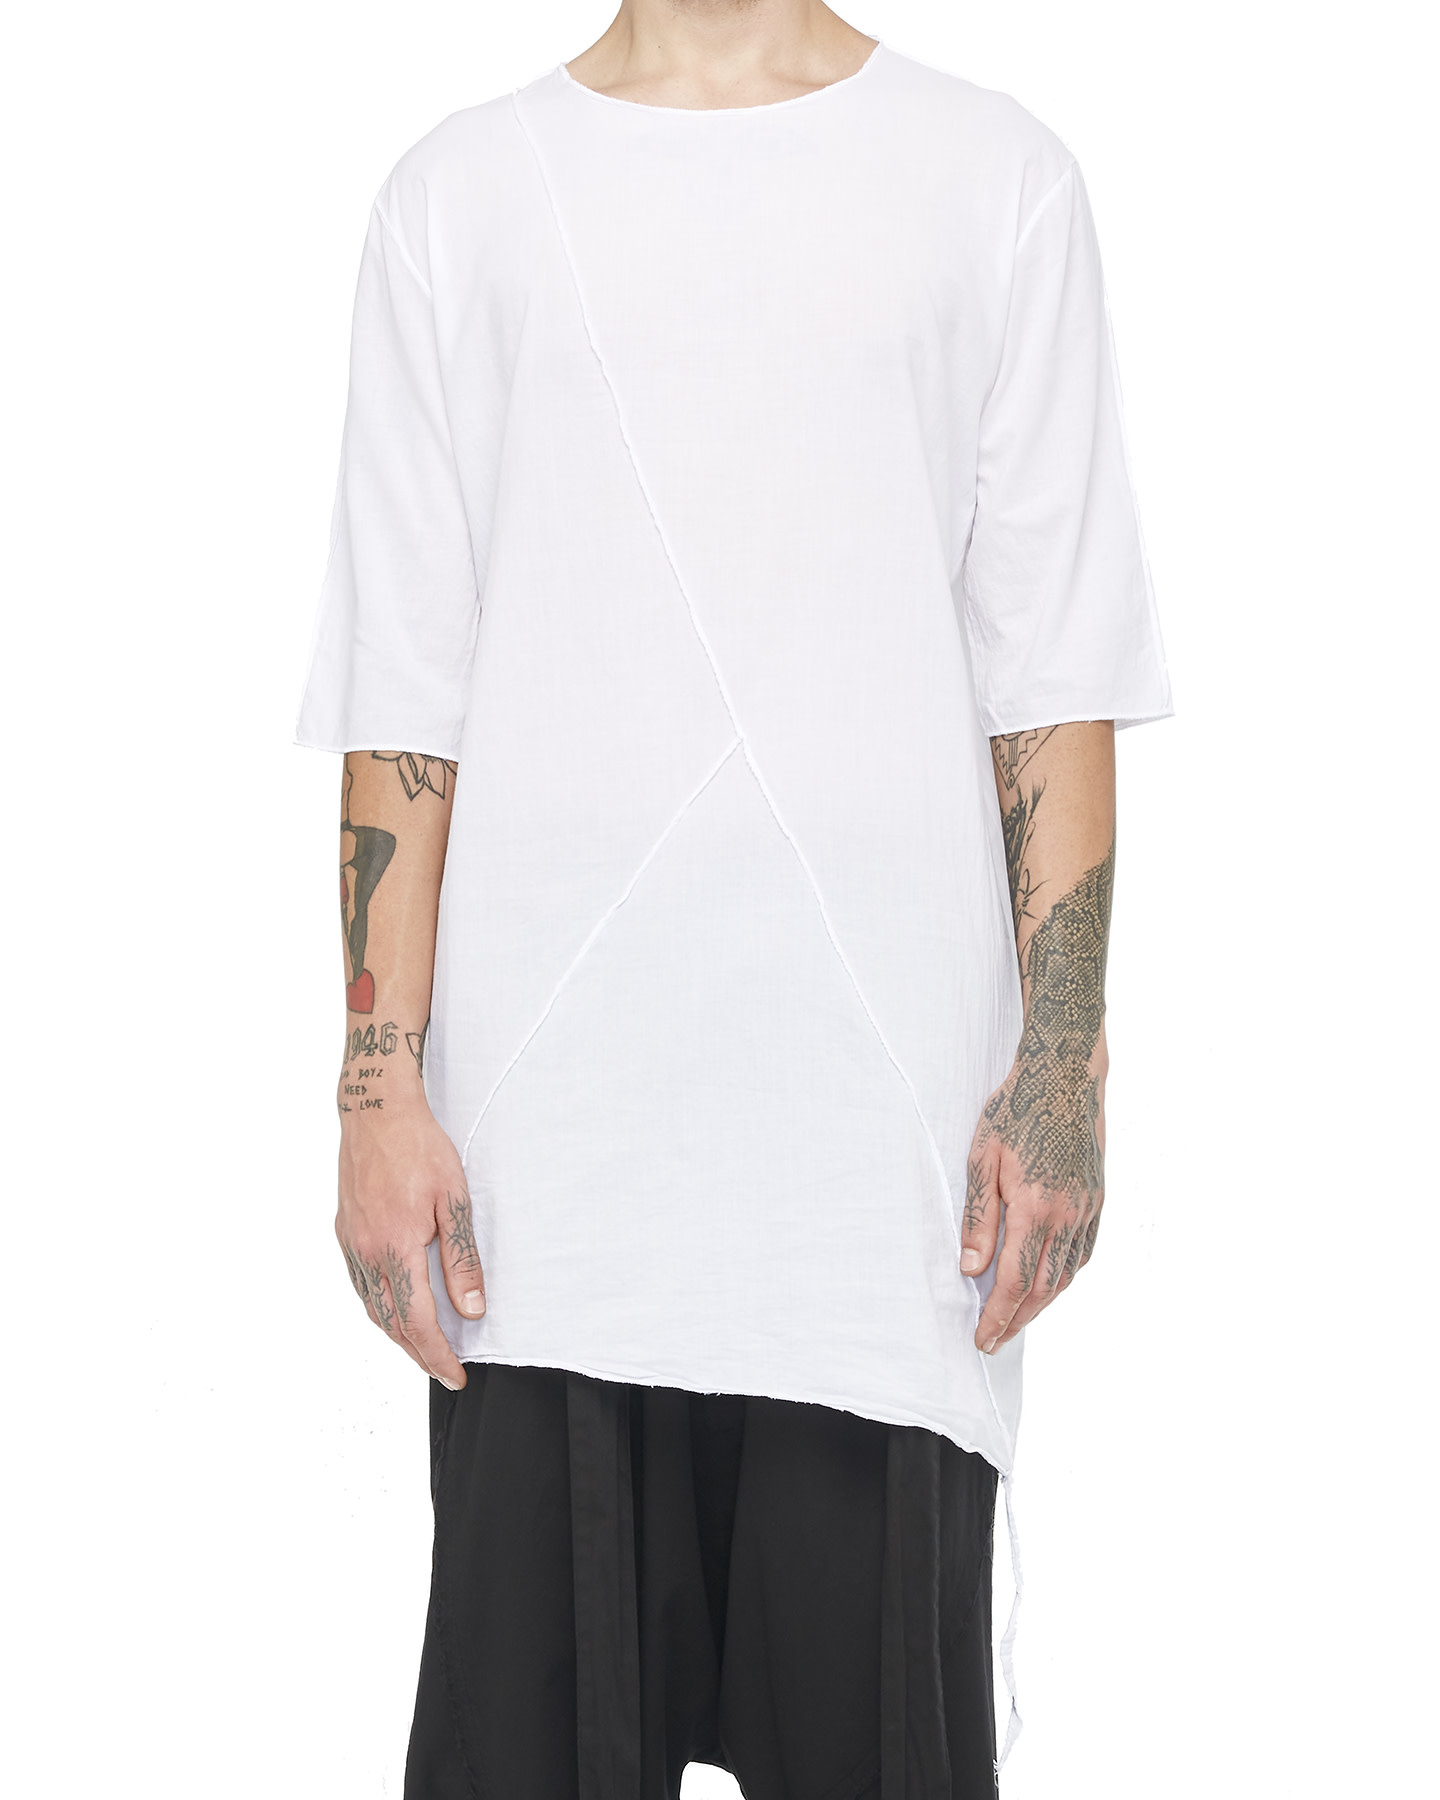 LONG SHIRT W/ BUTTONED SIDE - WHITE